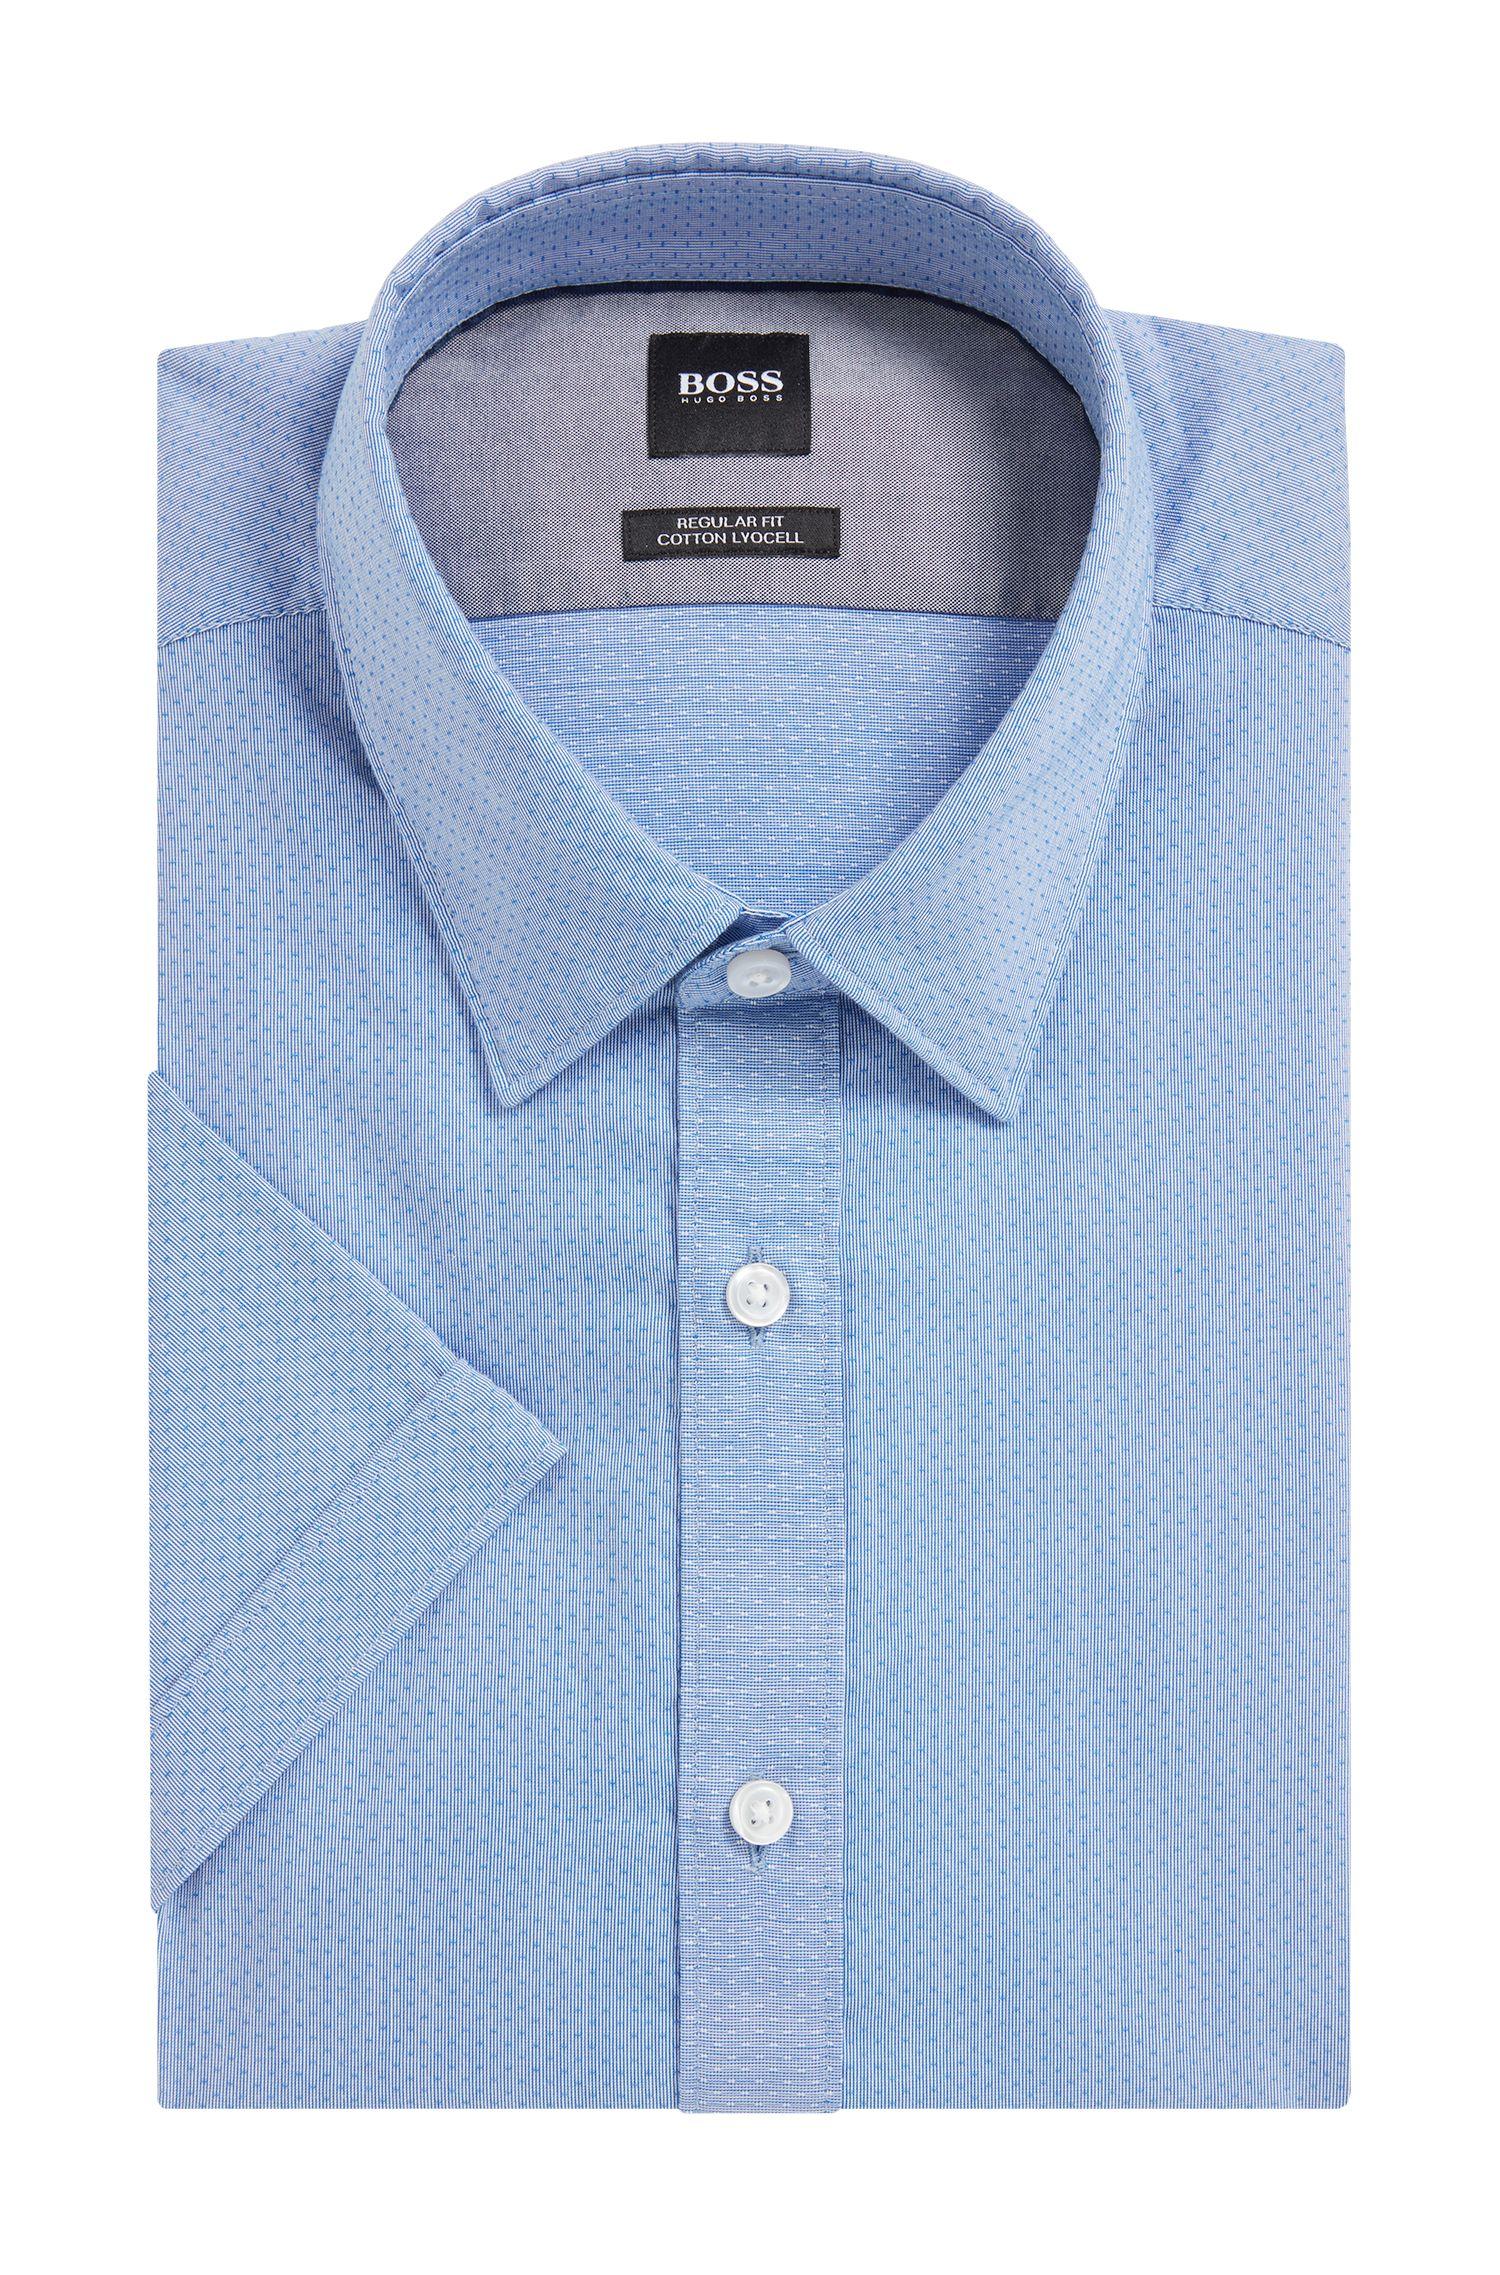 Regular-fit short-sleeved shirt in cotton-blend